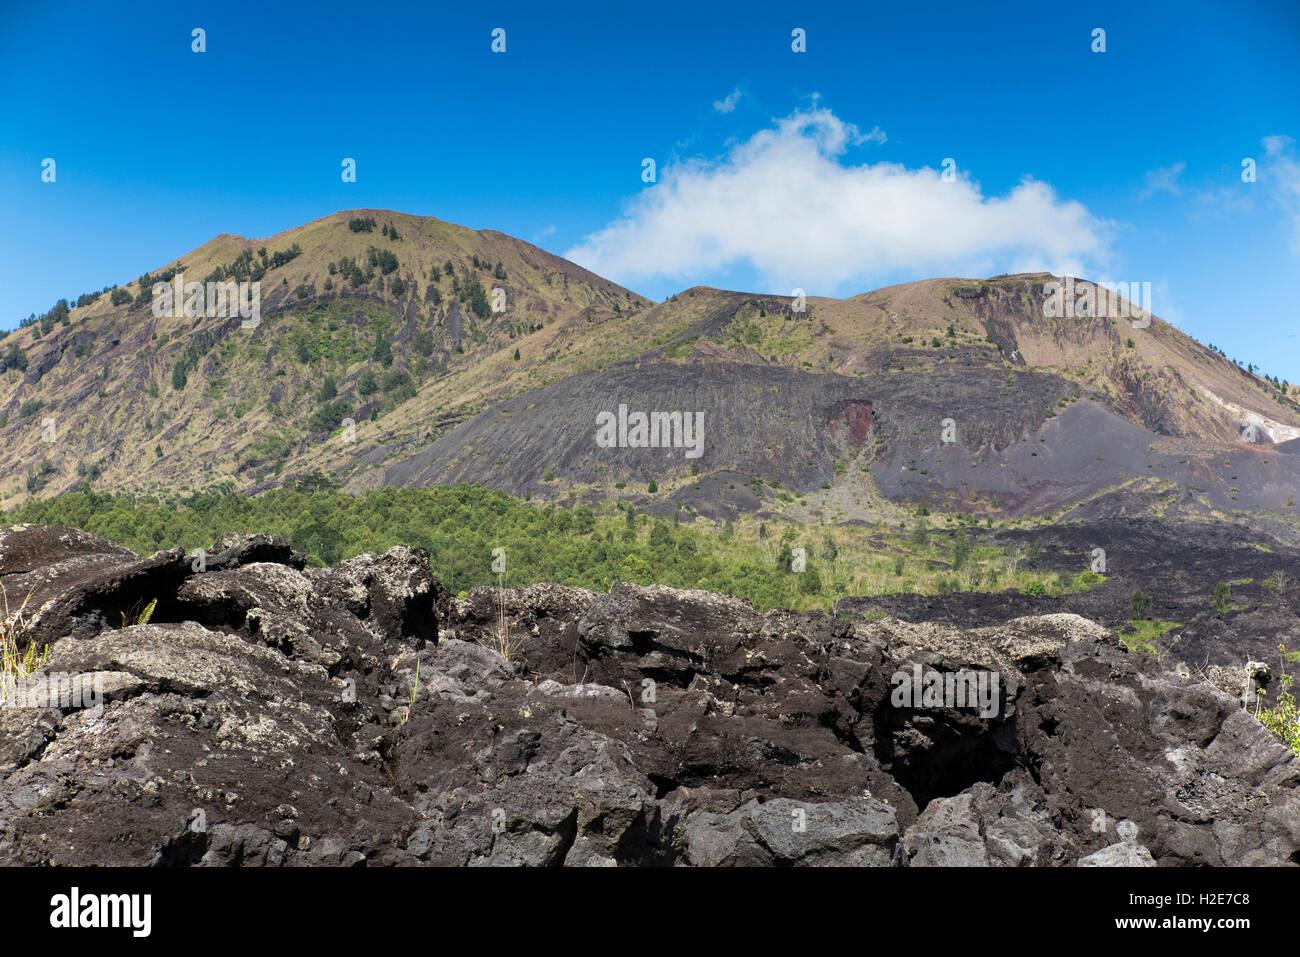 Indonesia, Bali, Kedisan, Gunung Batur, lava flow from 1974 eruption - Stock Image